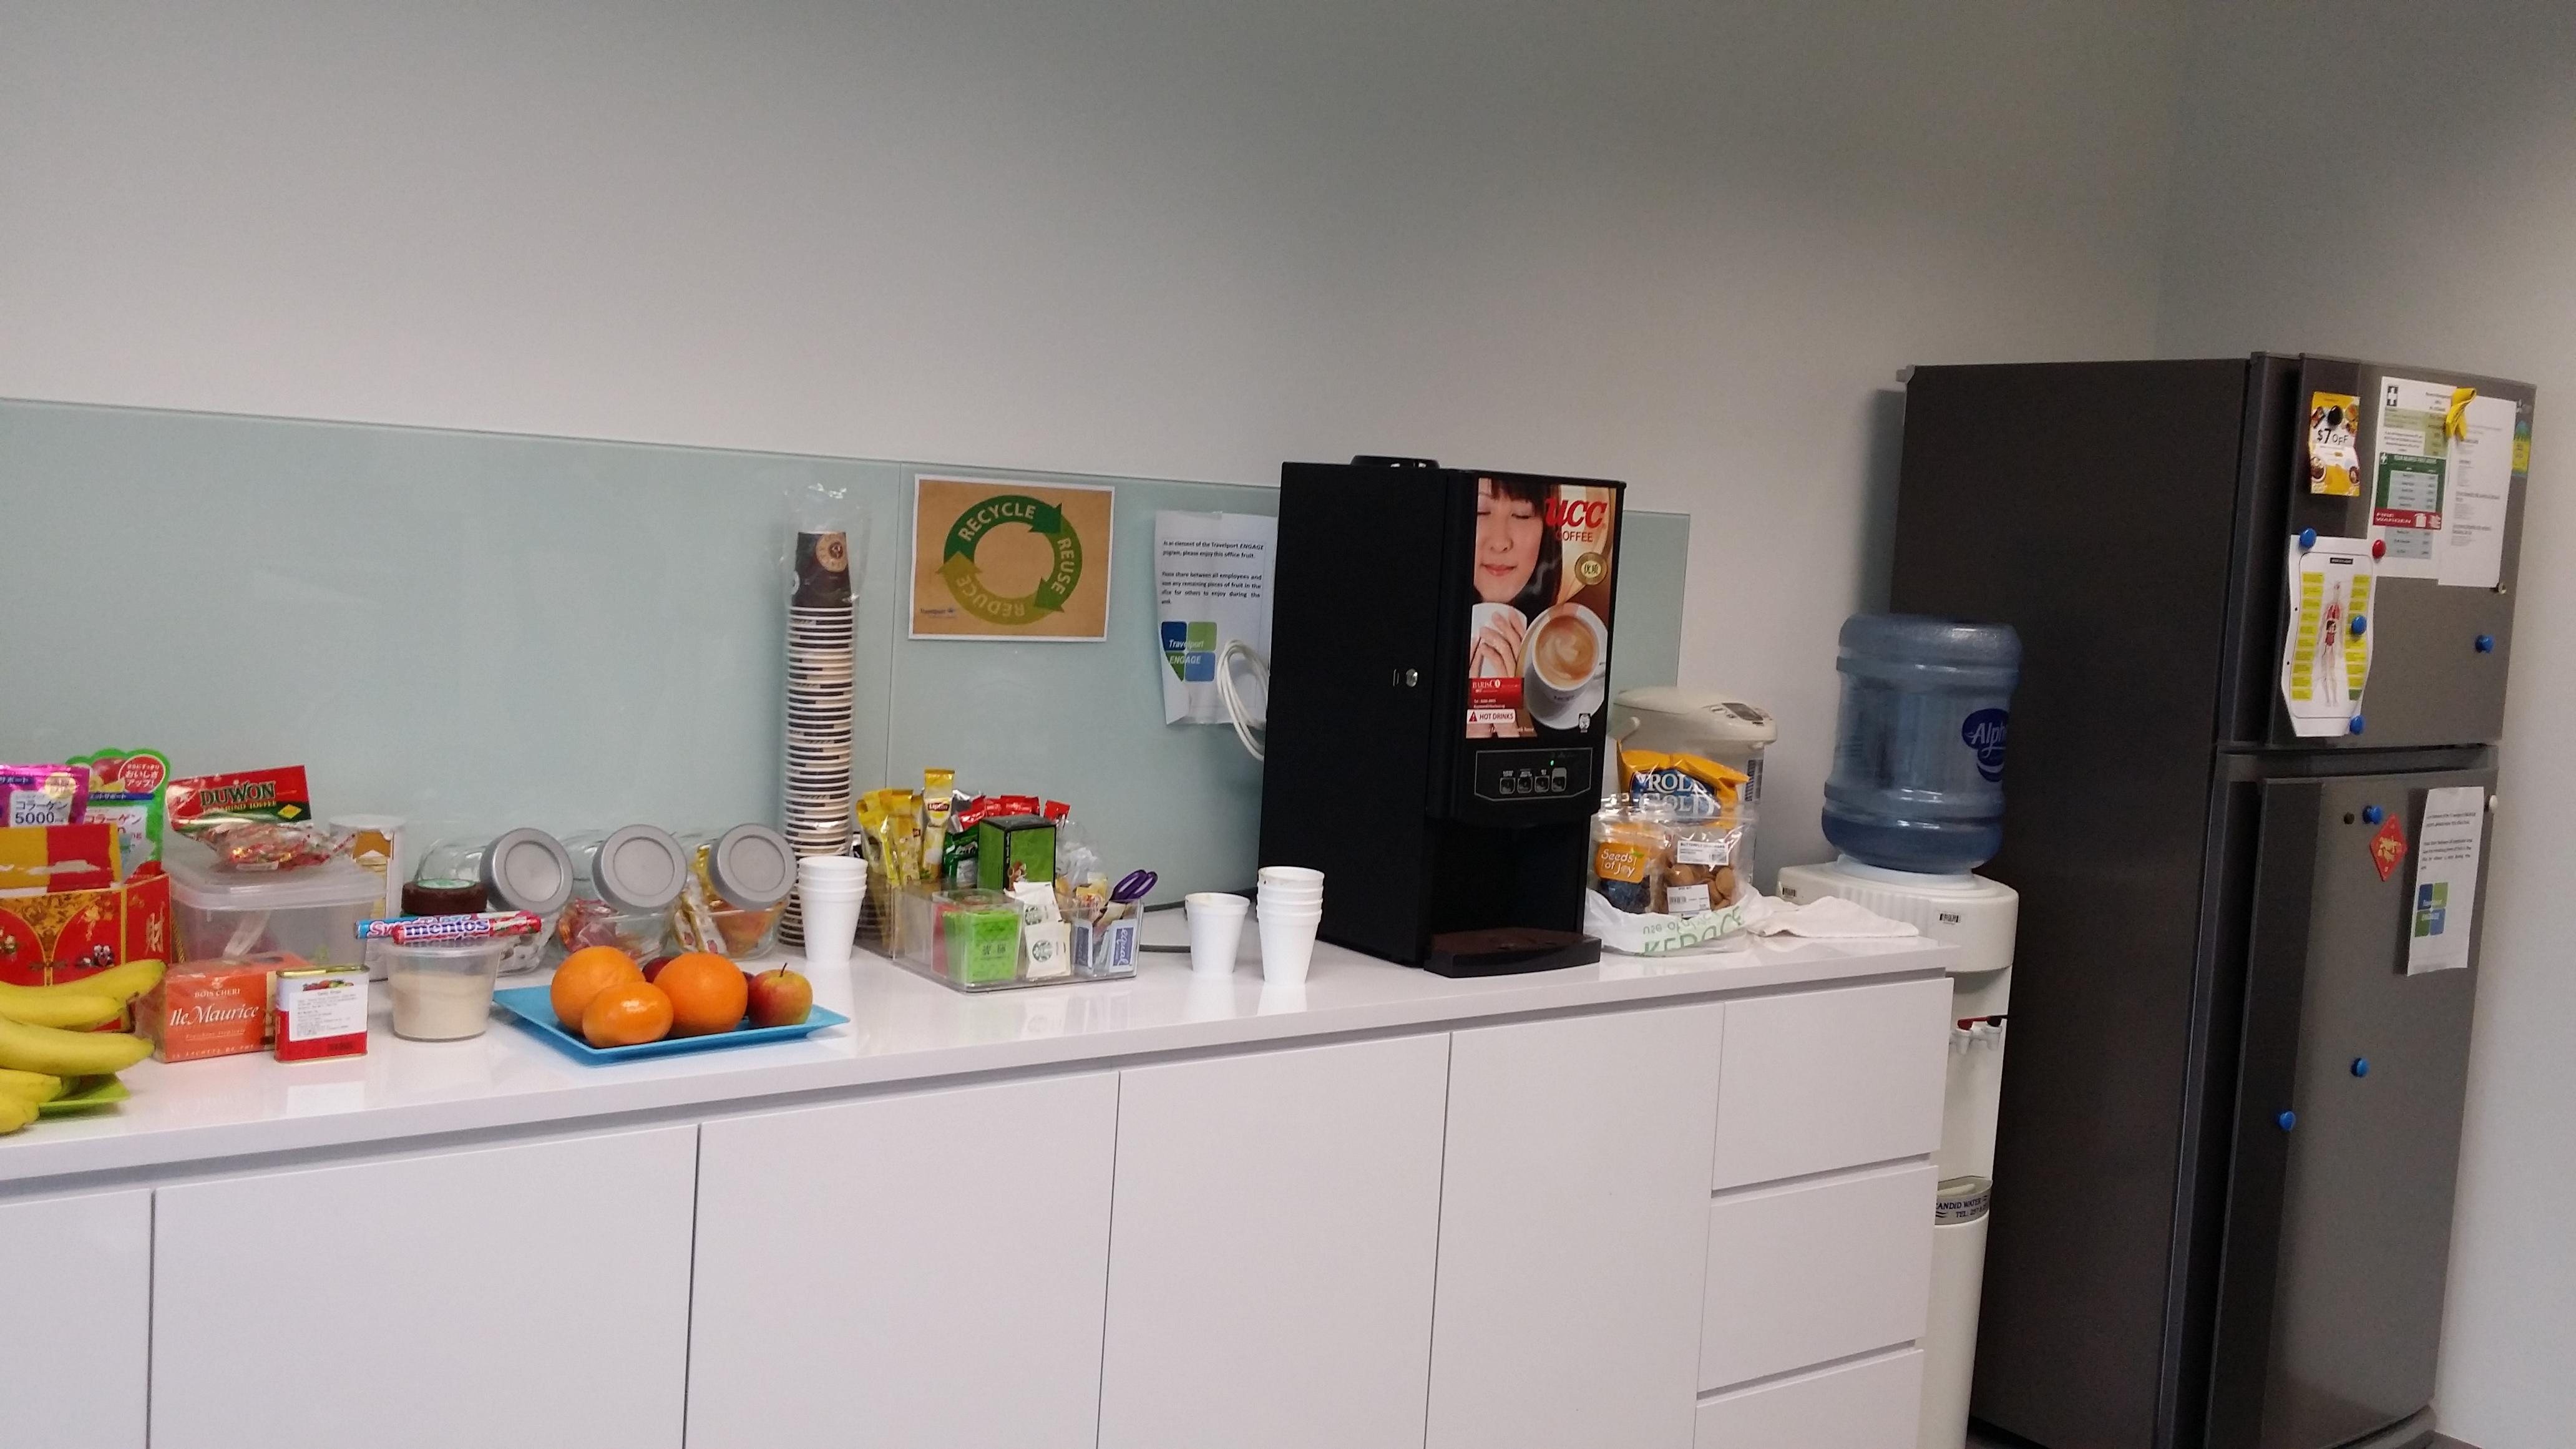 Coffee Machine @ MNC Office Pantry